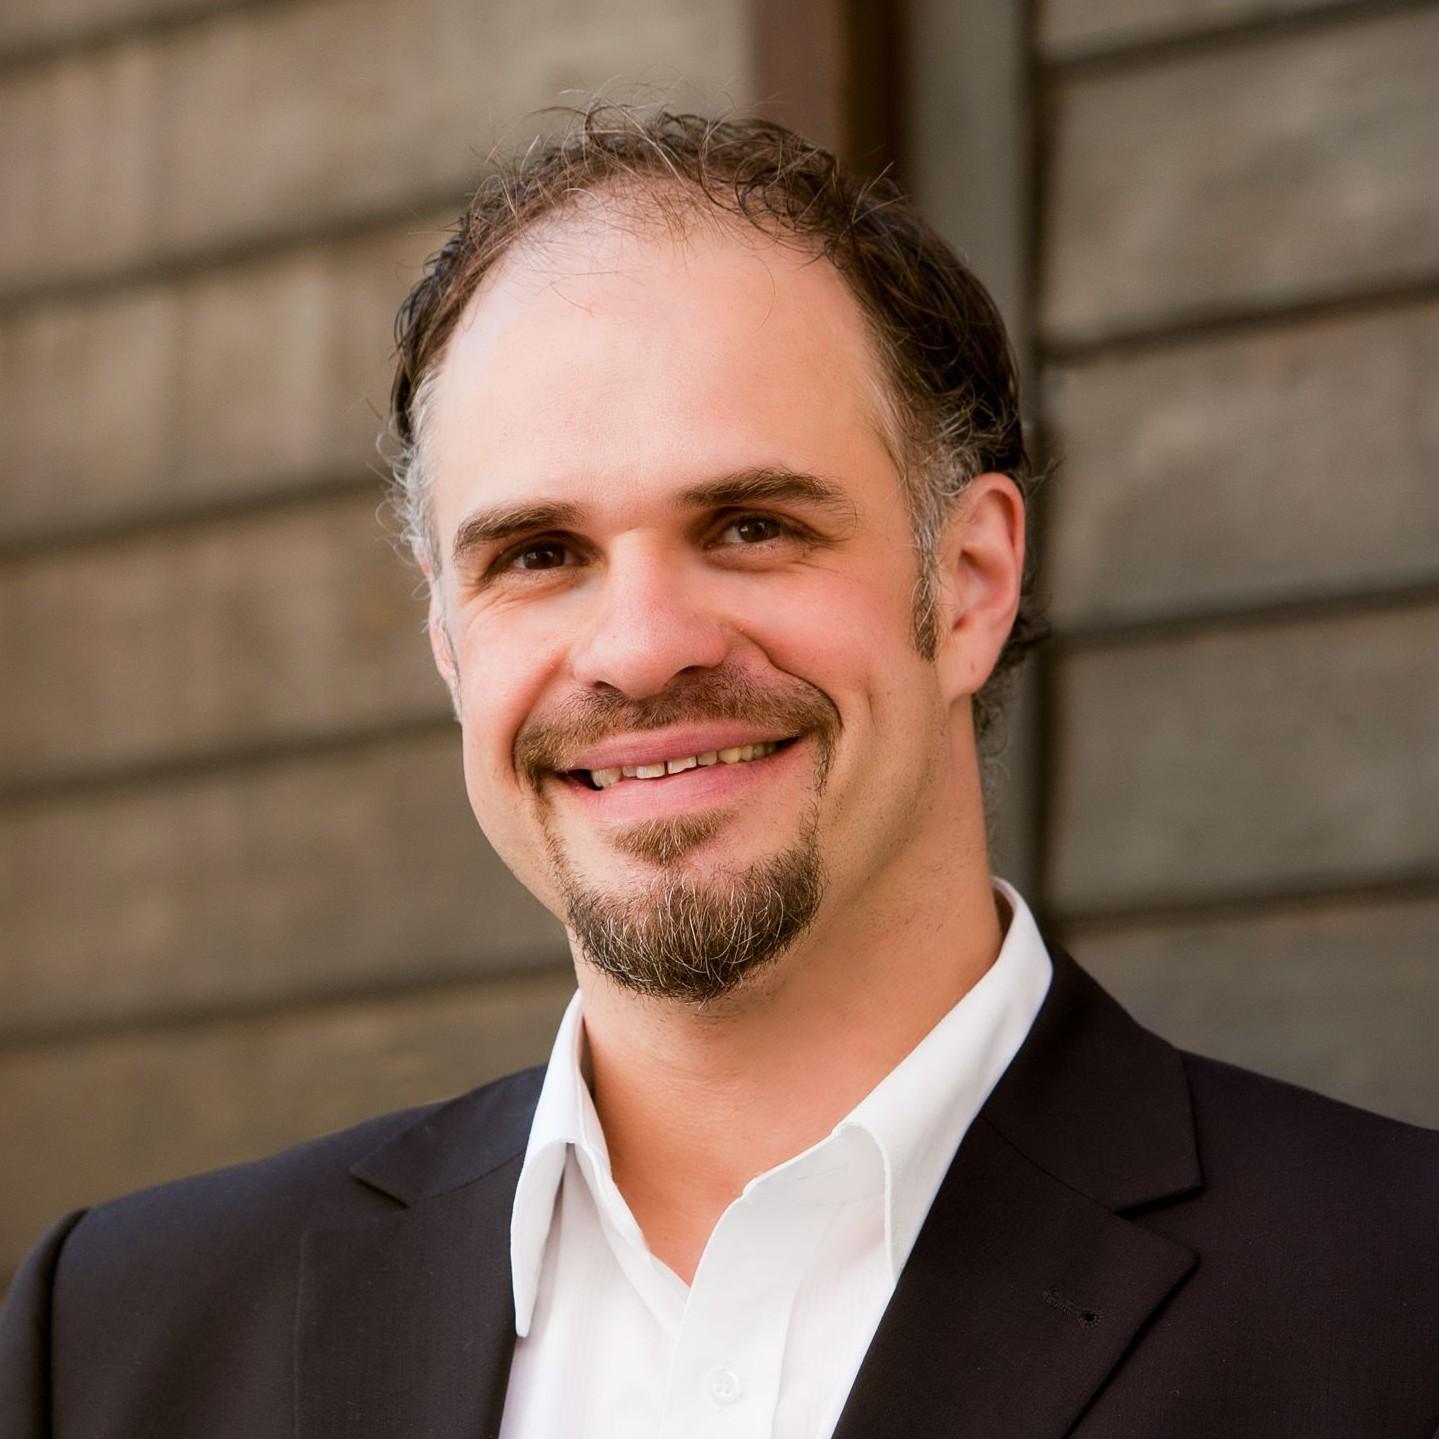 Prof. Dr. Michael BossleProf. Dr. Michael Bossle